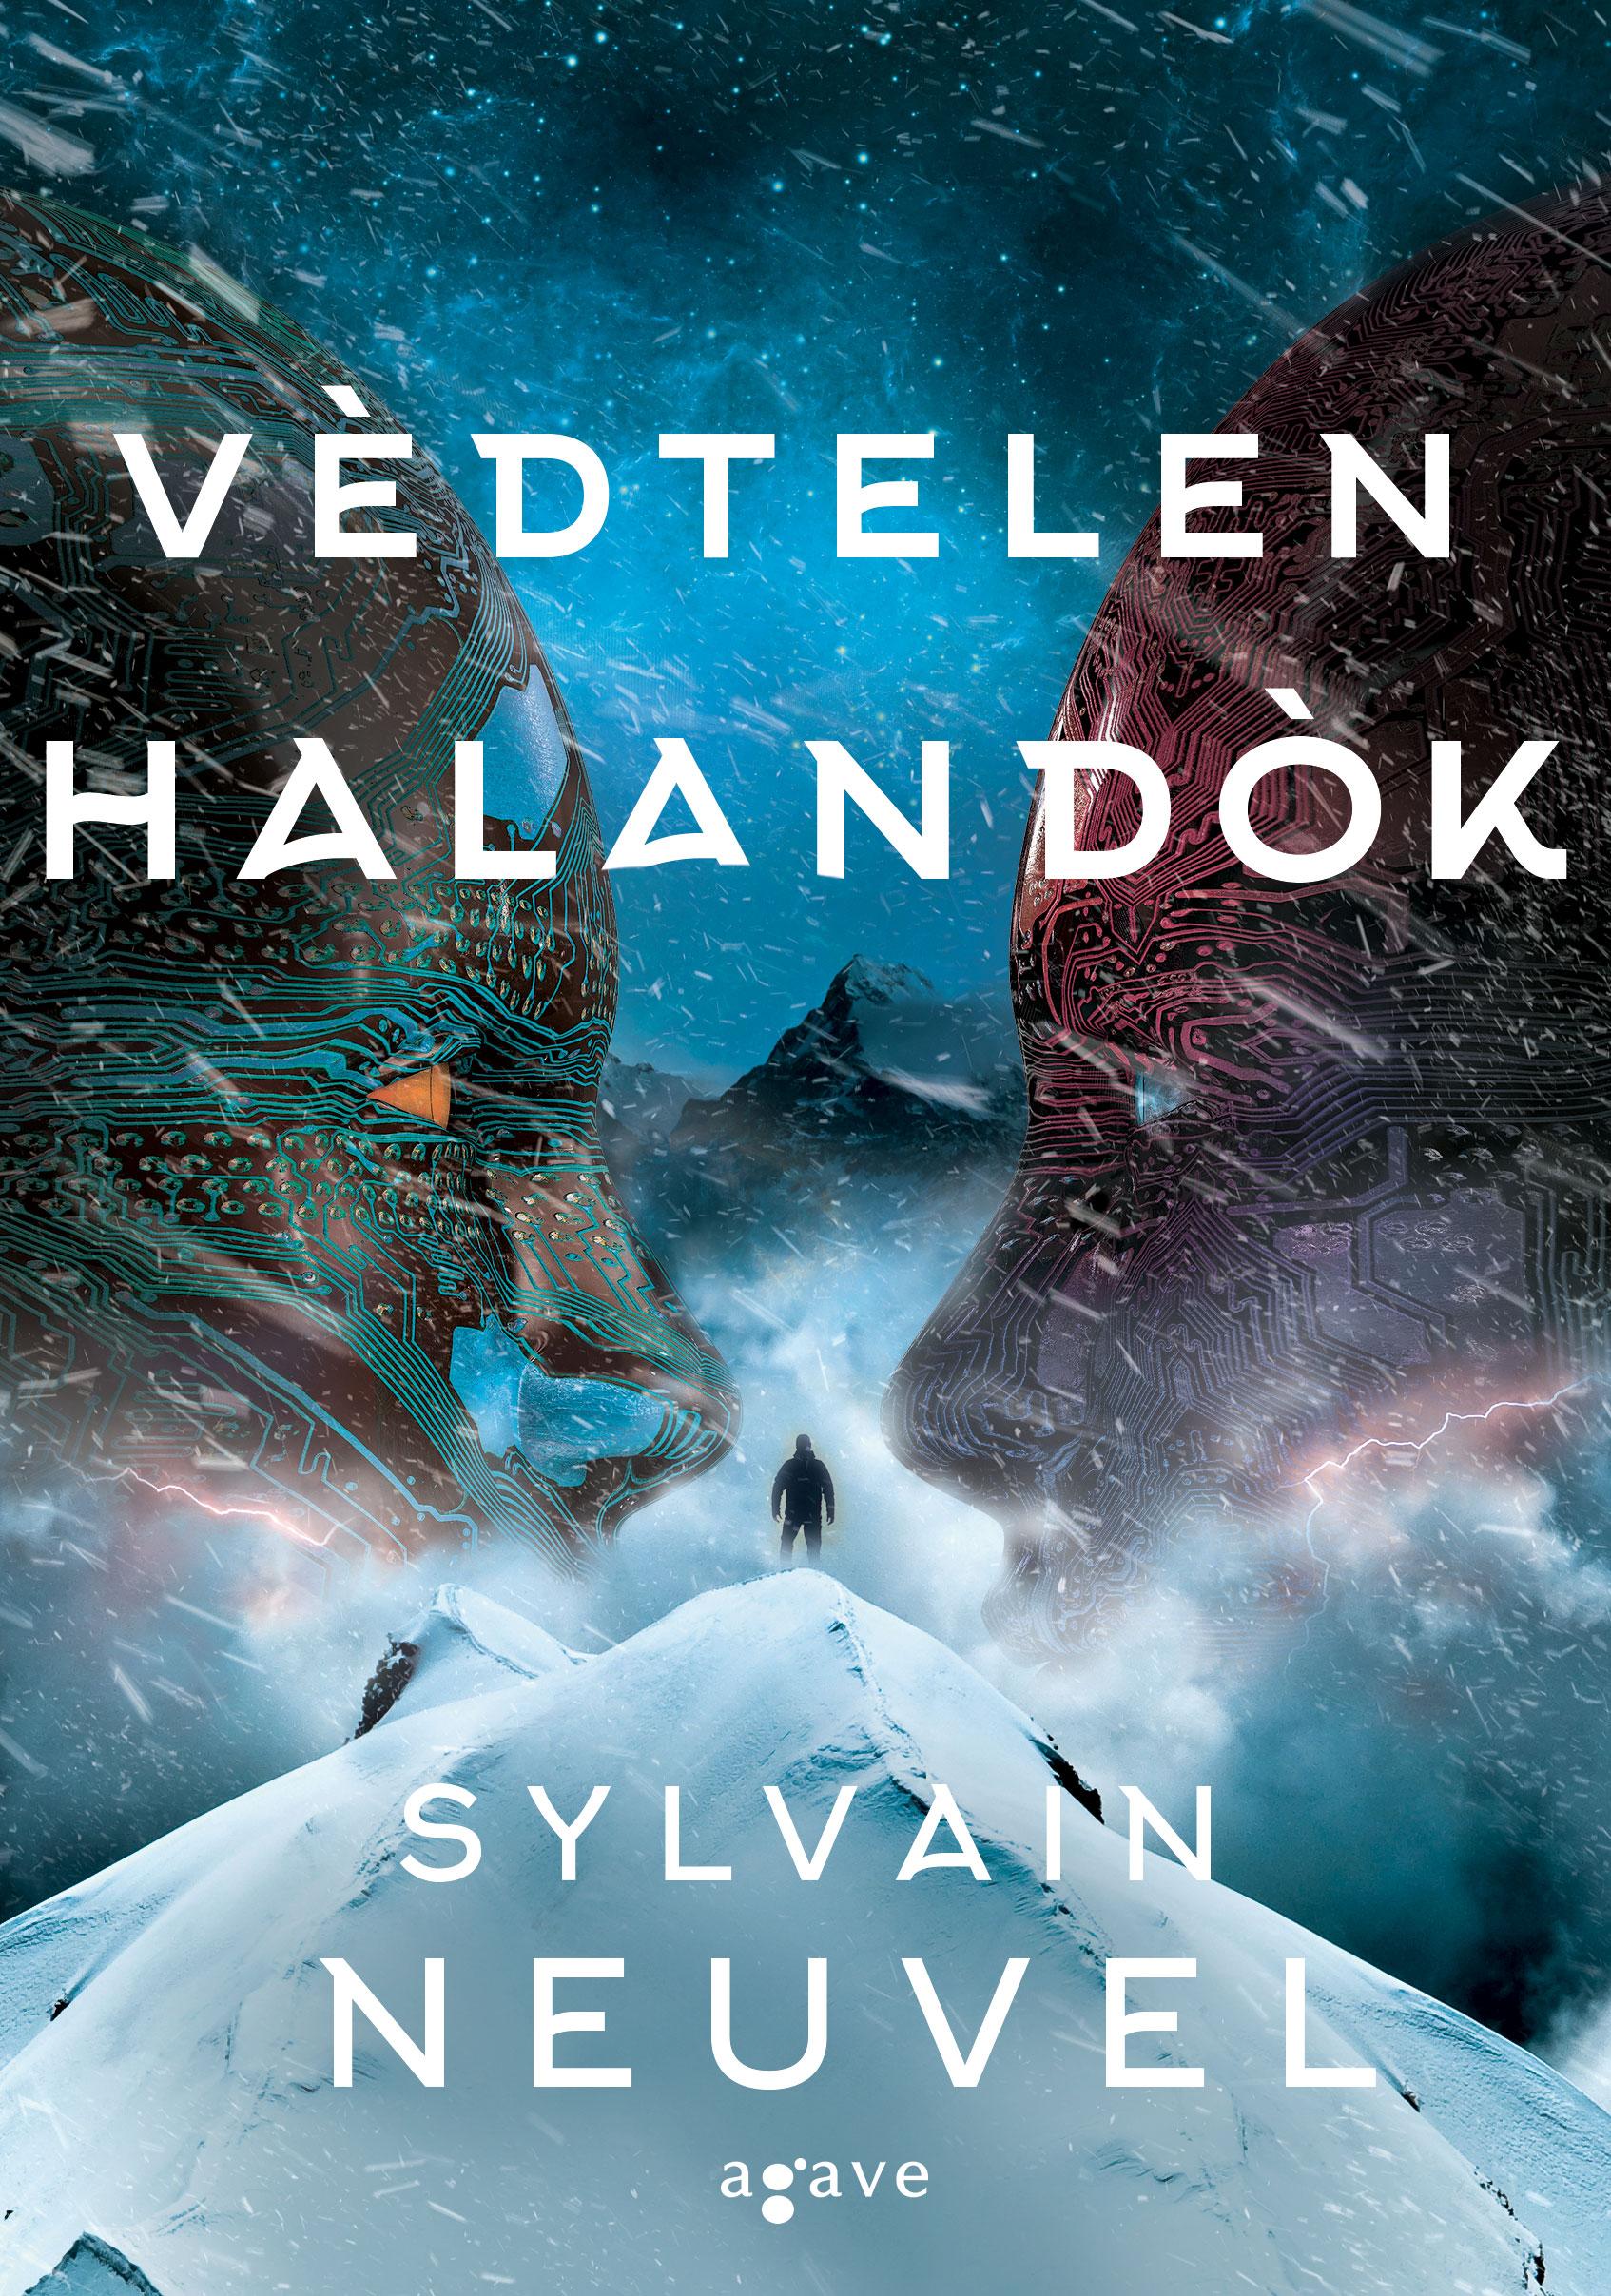 sylvain_neuvel_vedtelen_halandok_b1.jpg